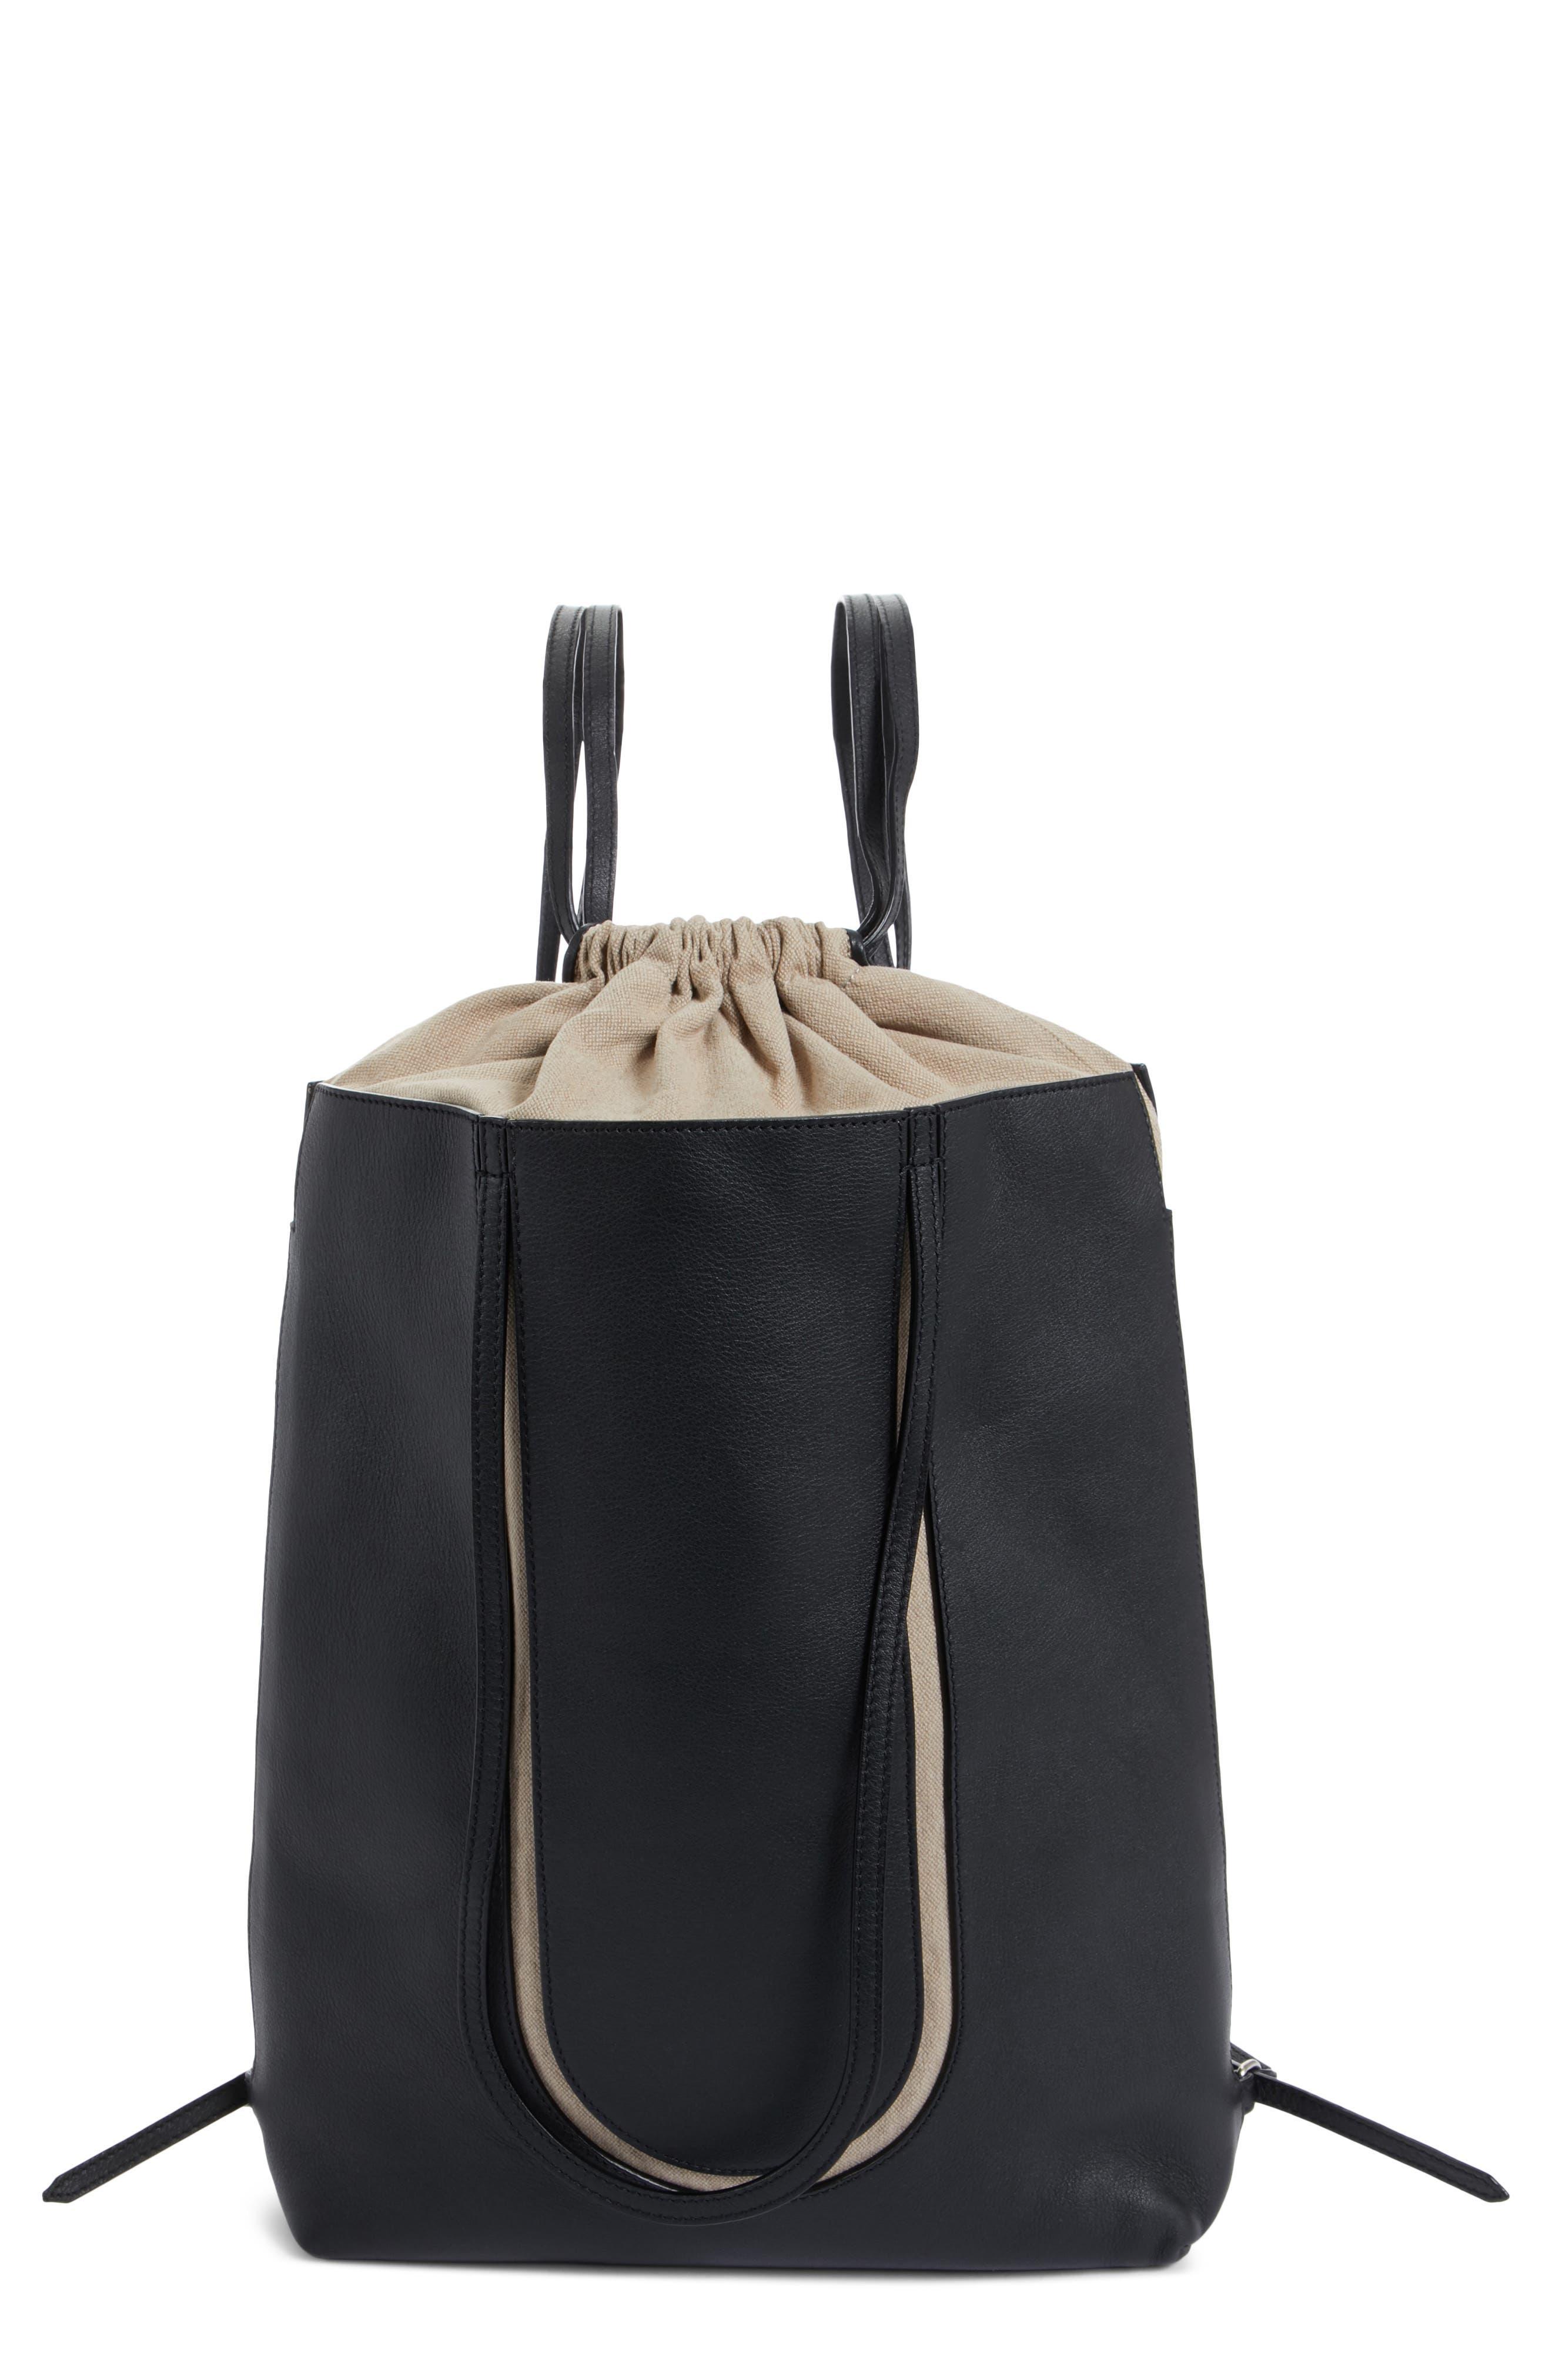 Calfskin Leather Backpack,                         Main,                         color, Black